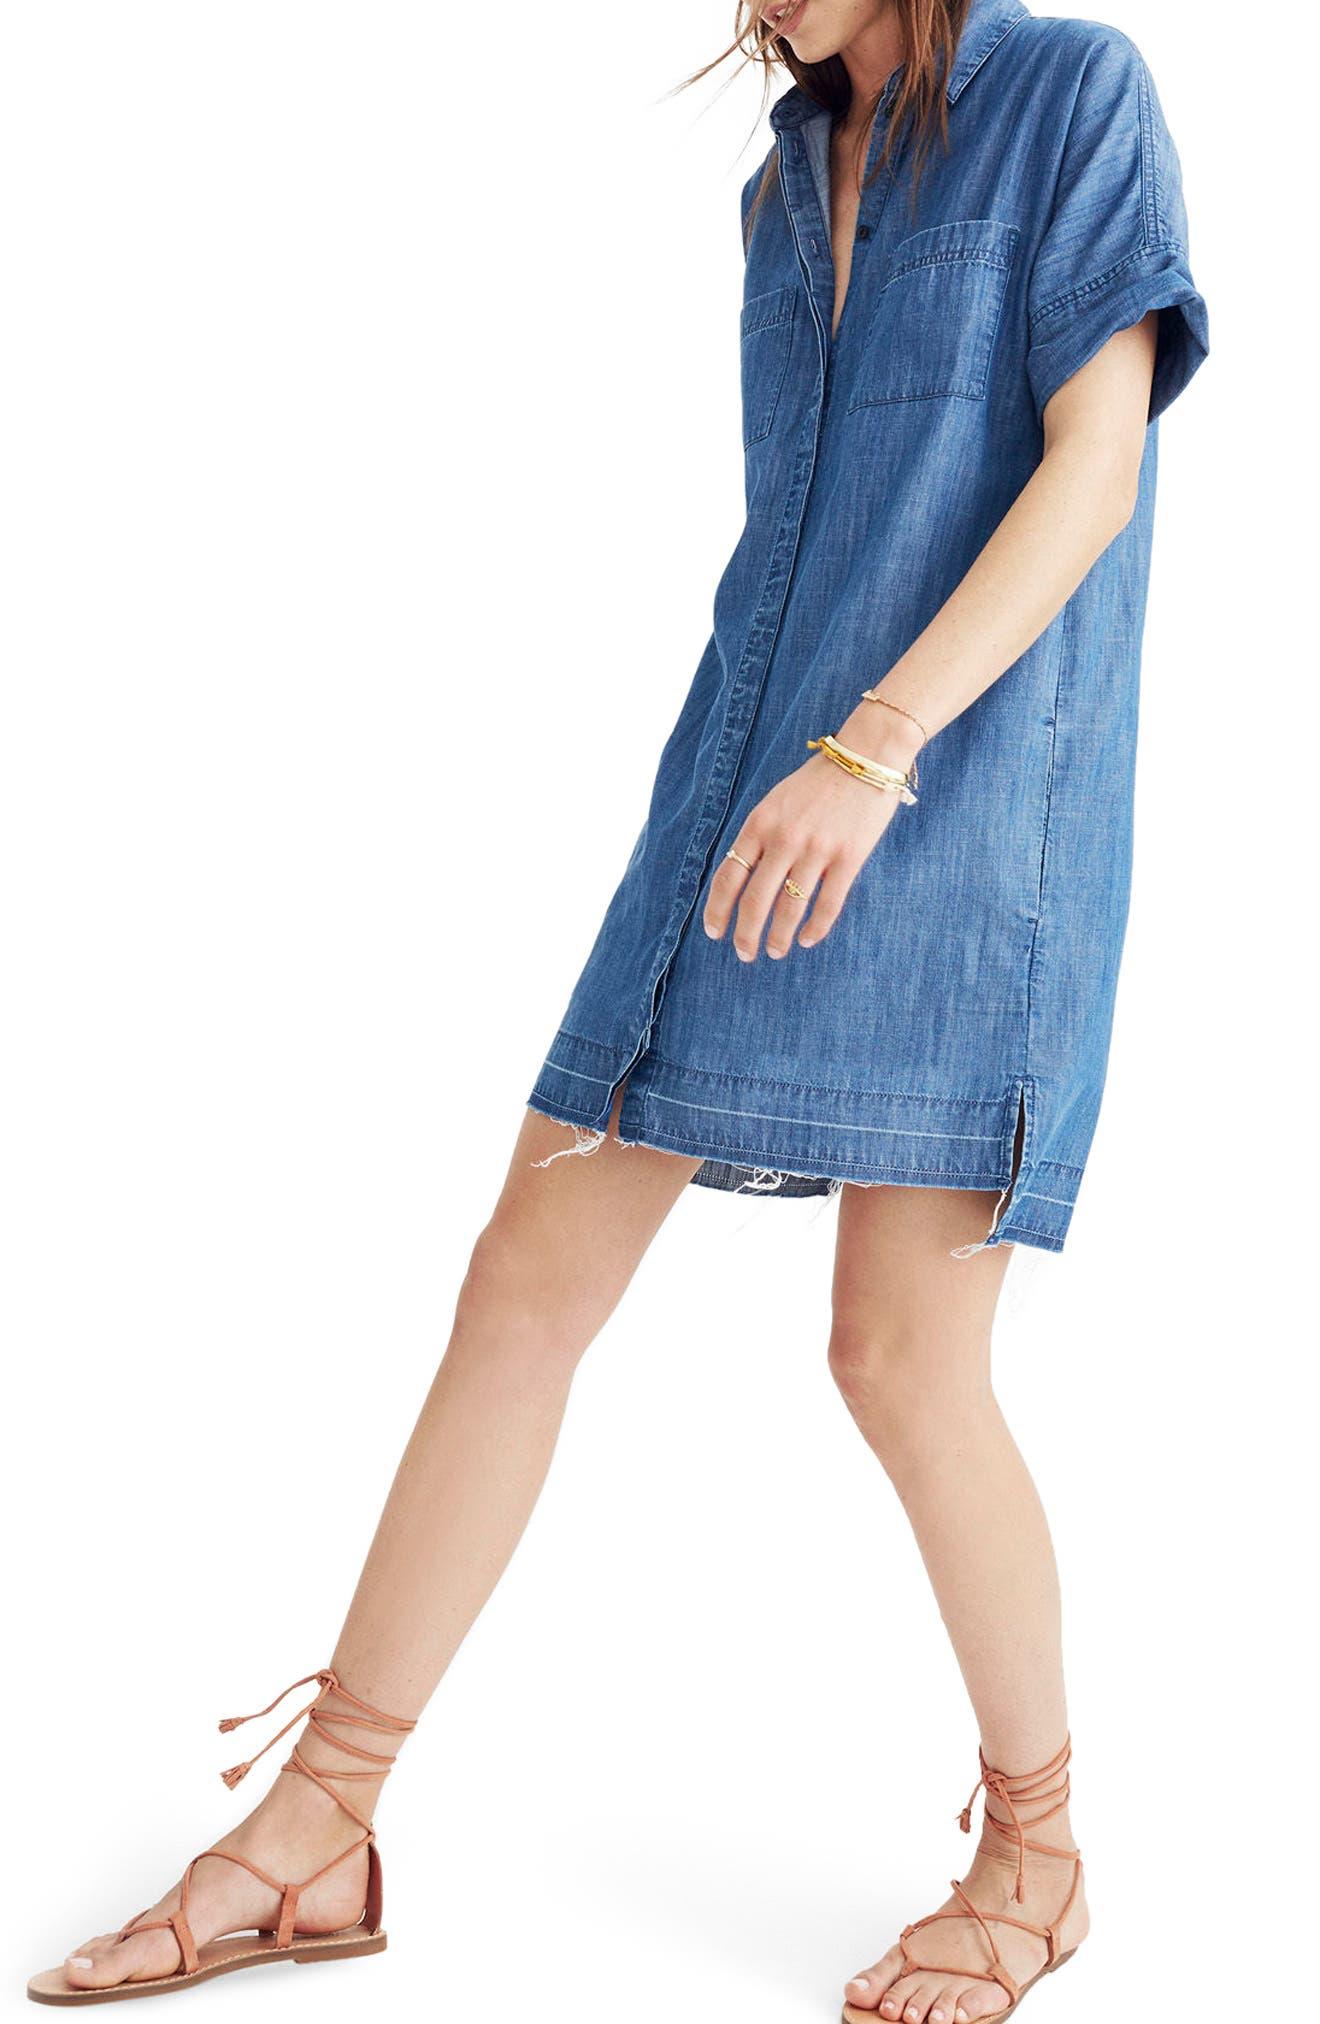 Alternate Image 1 Selected - Madewell Raw Edge Denim Shirtdress